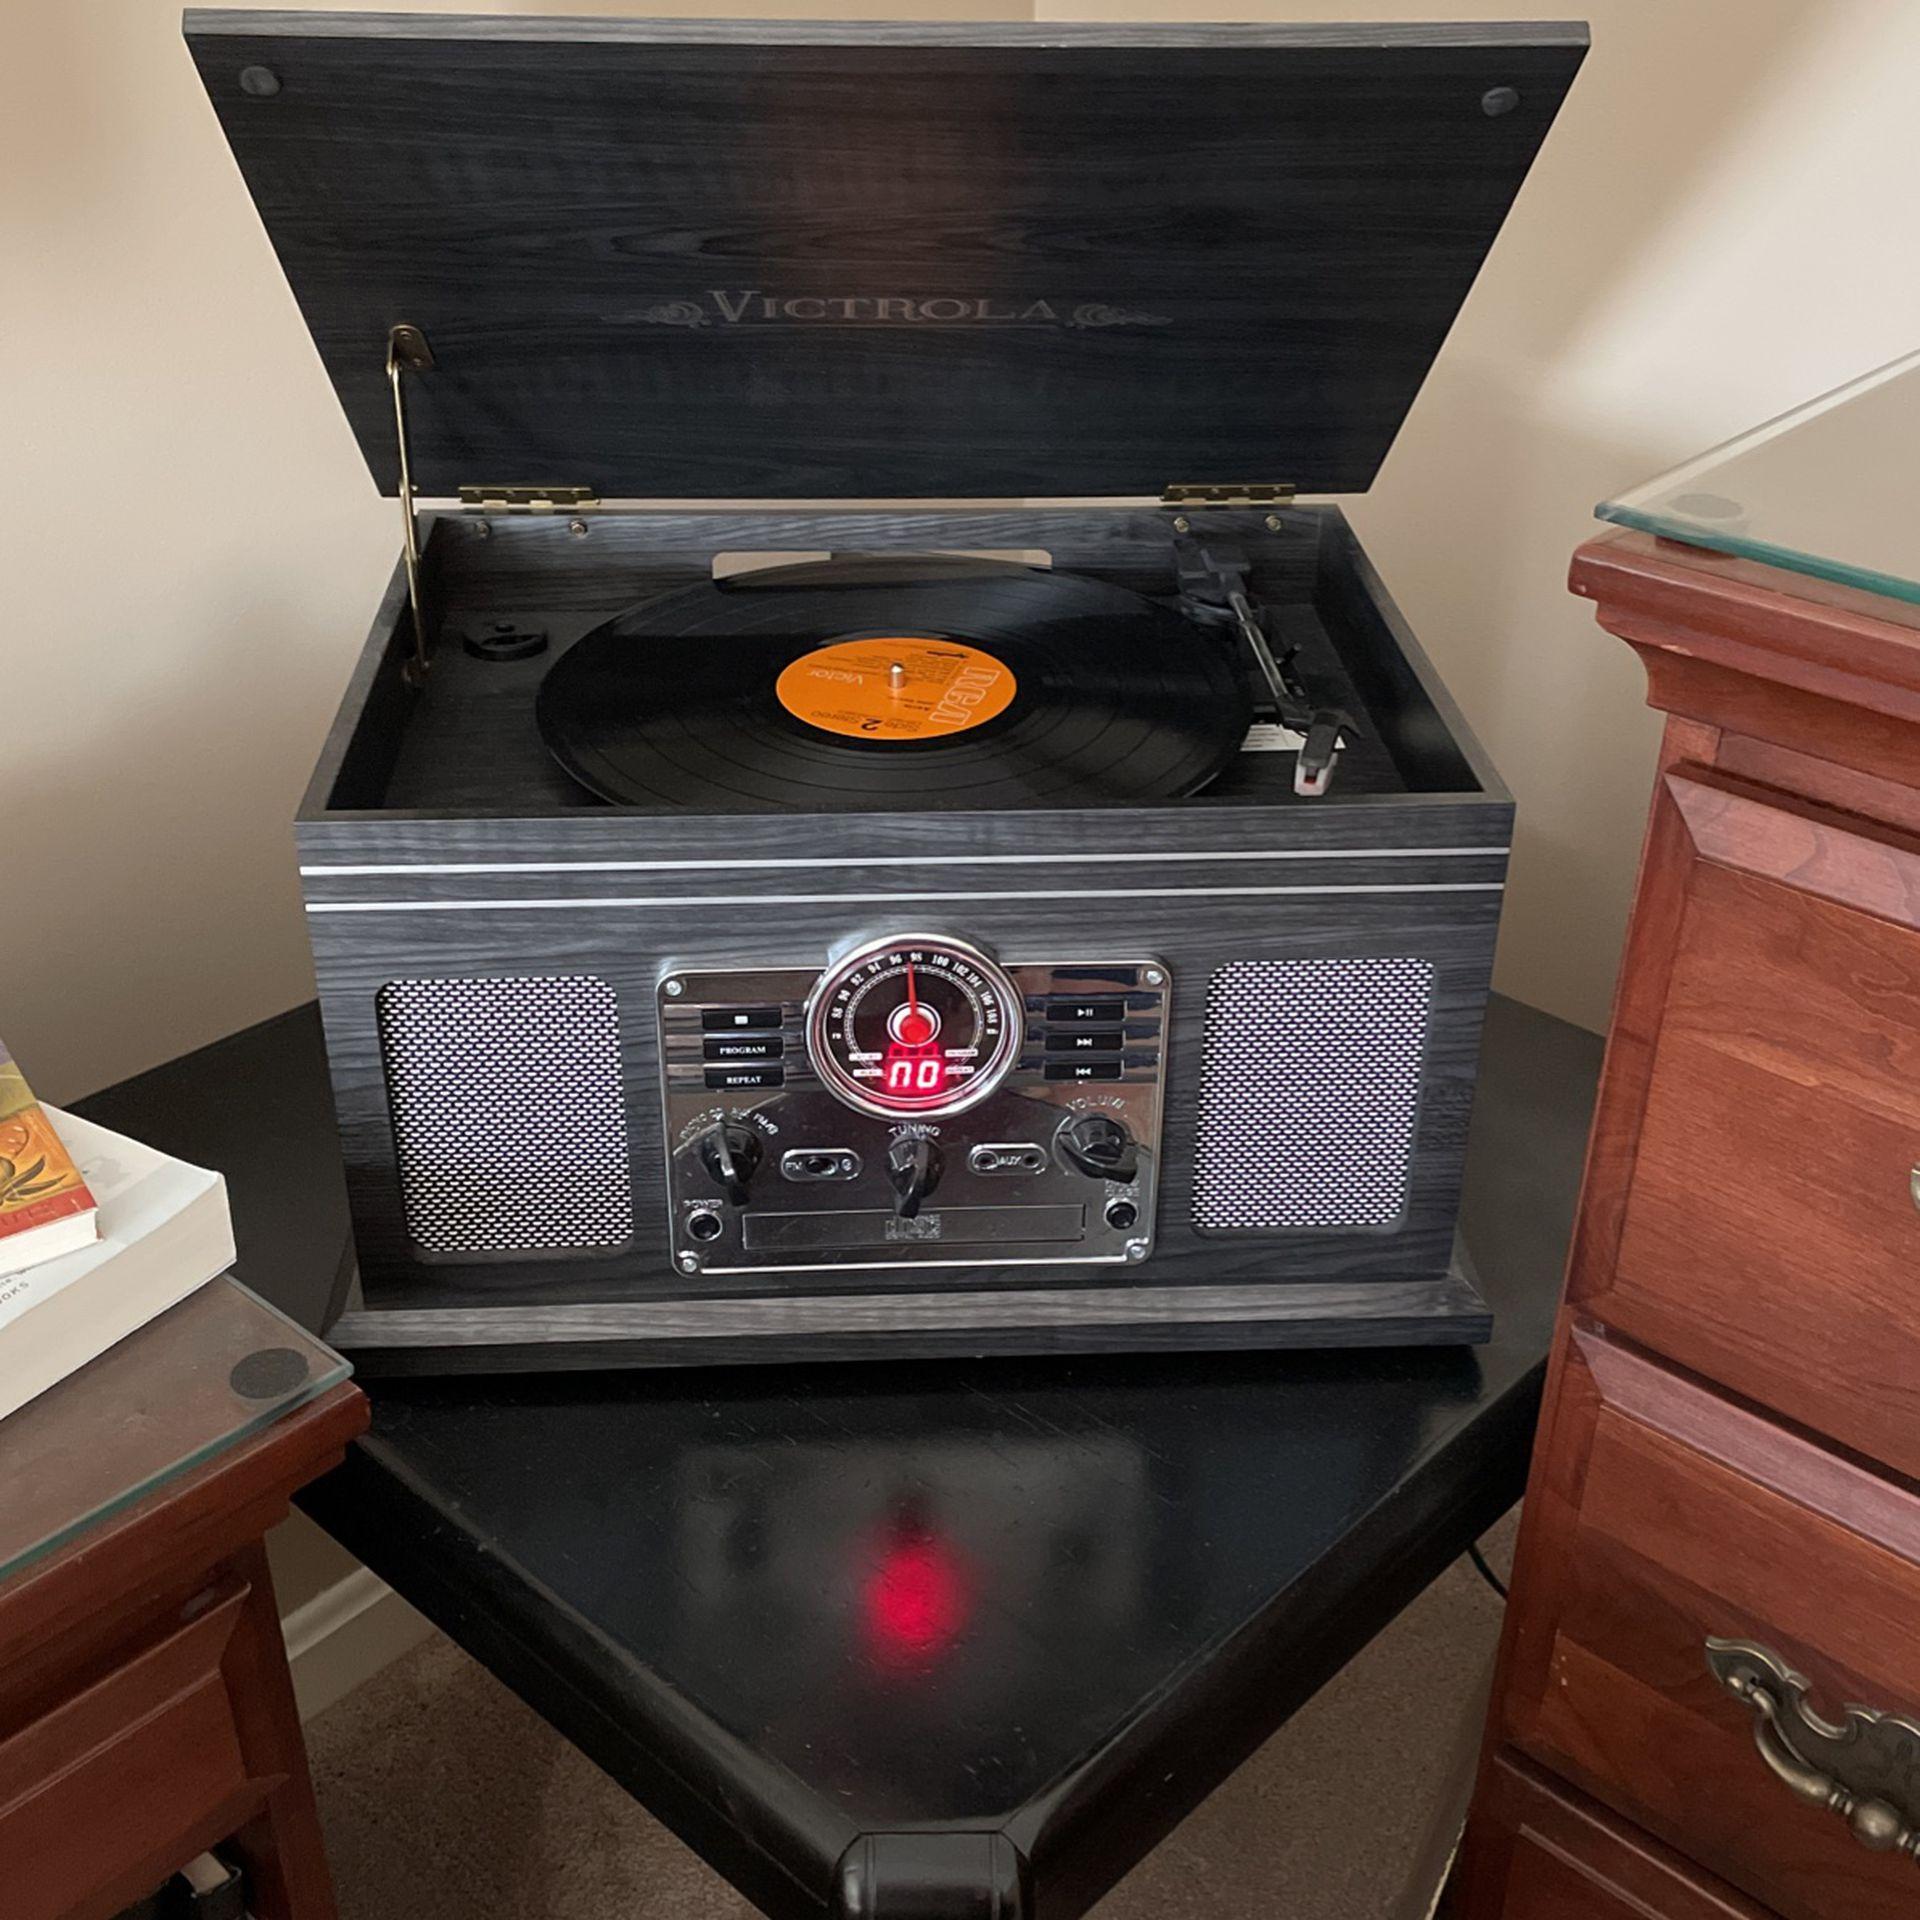 Victrola Record/CD/Tape/AUX/Bluetooth/Radio